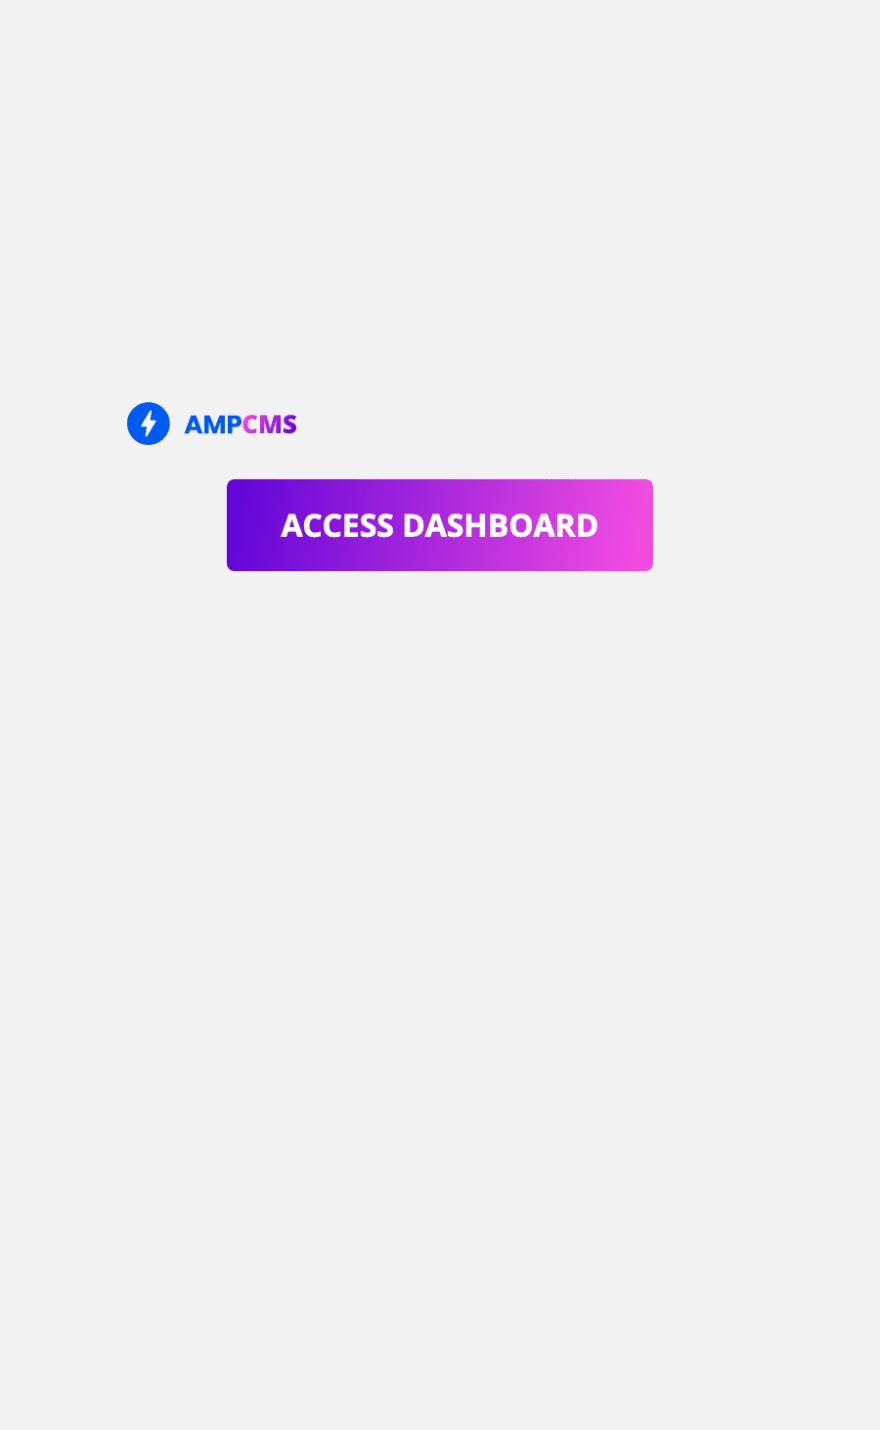 Enter Dashboard